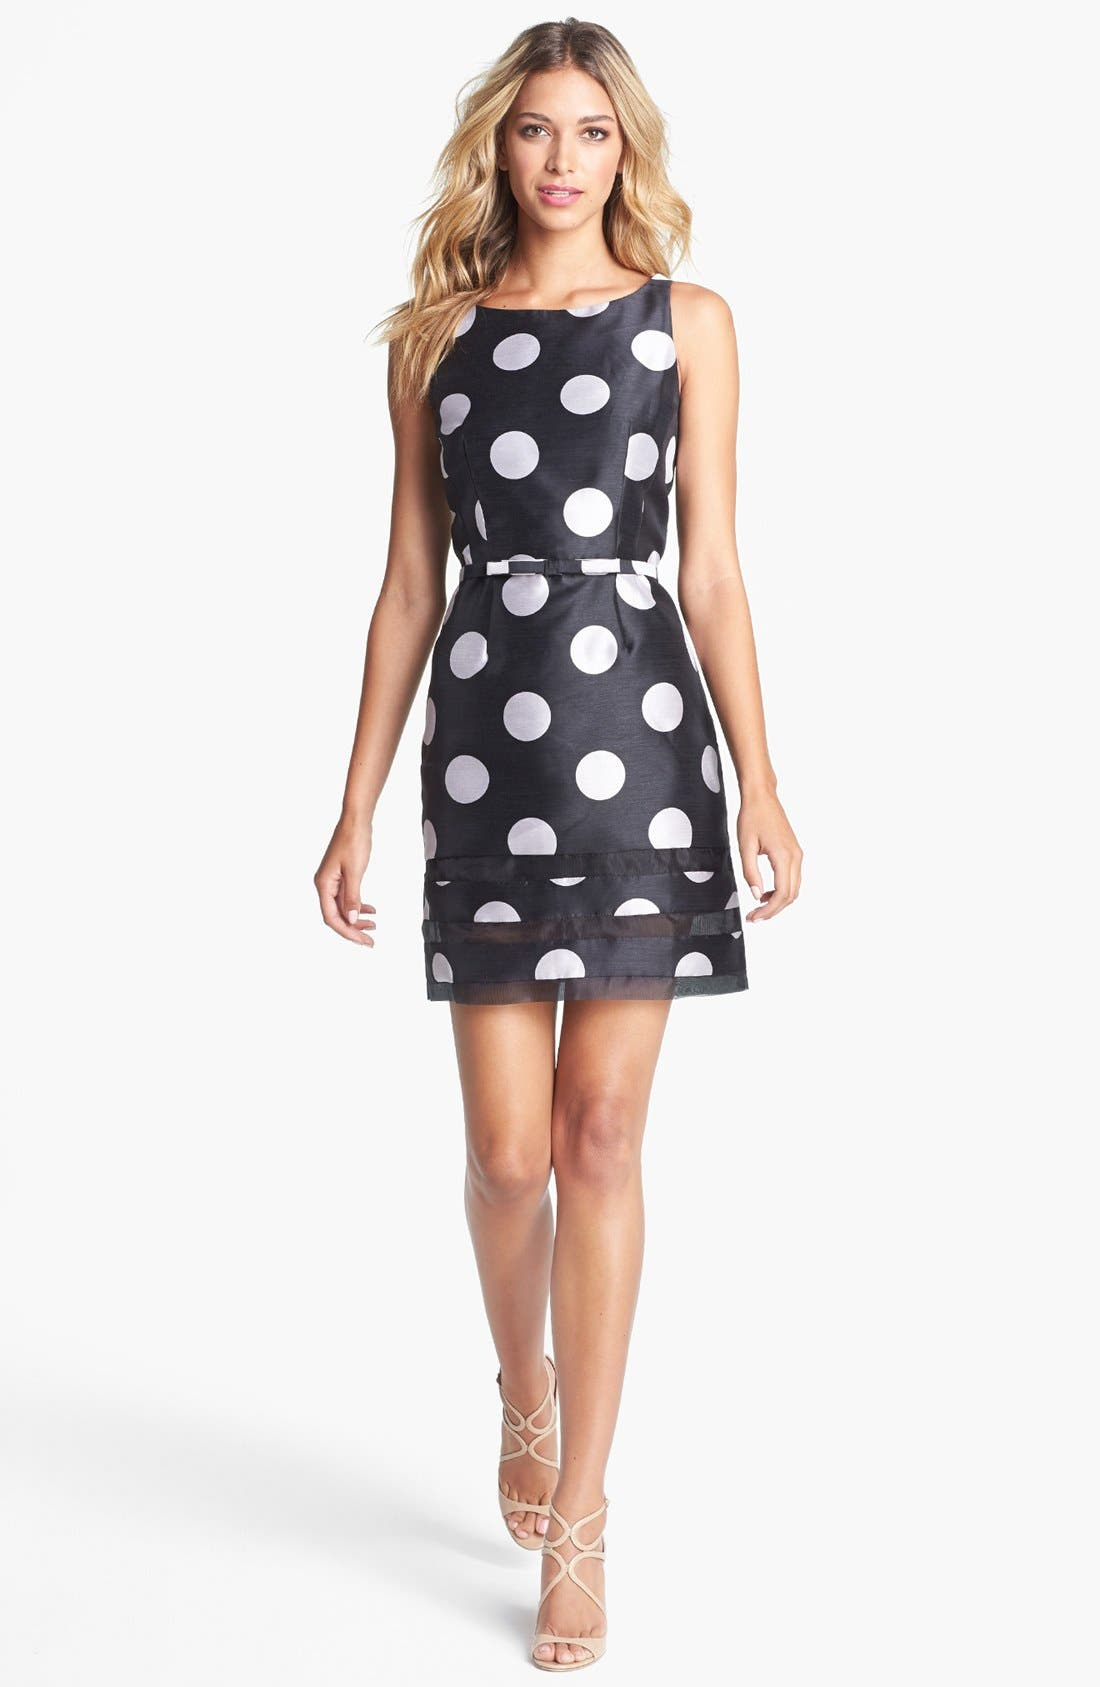 Main Image - Taylor Dresses Polka Dot Sheath Dress